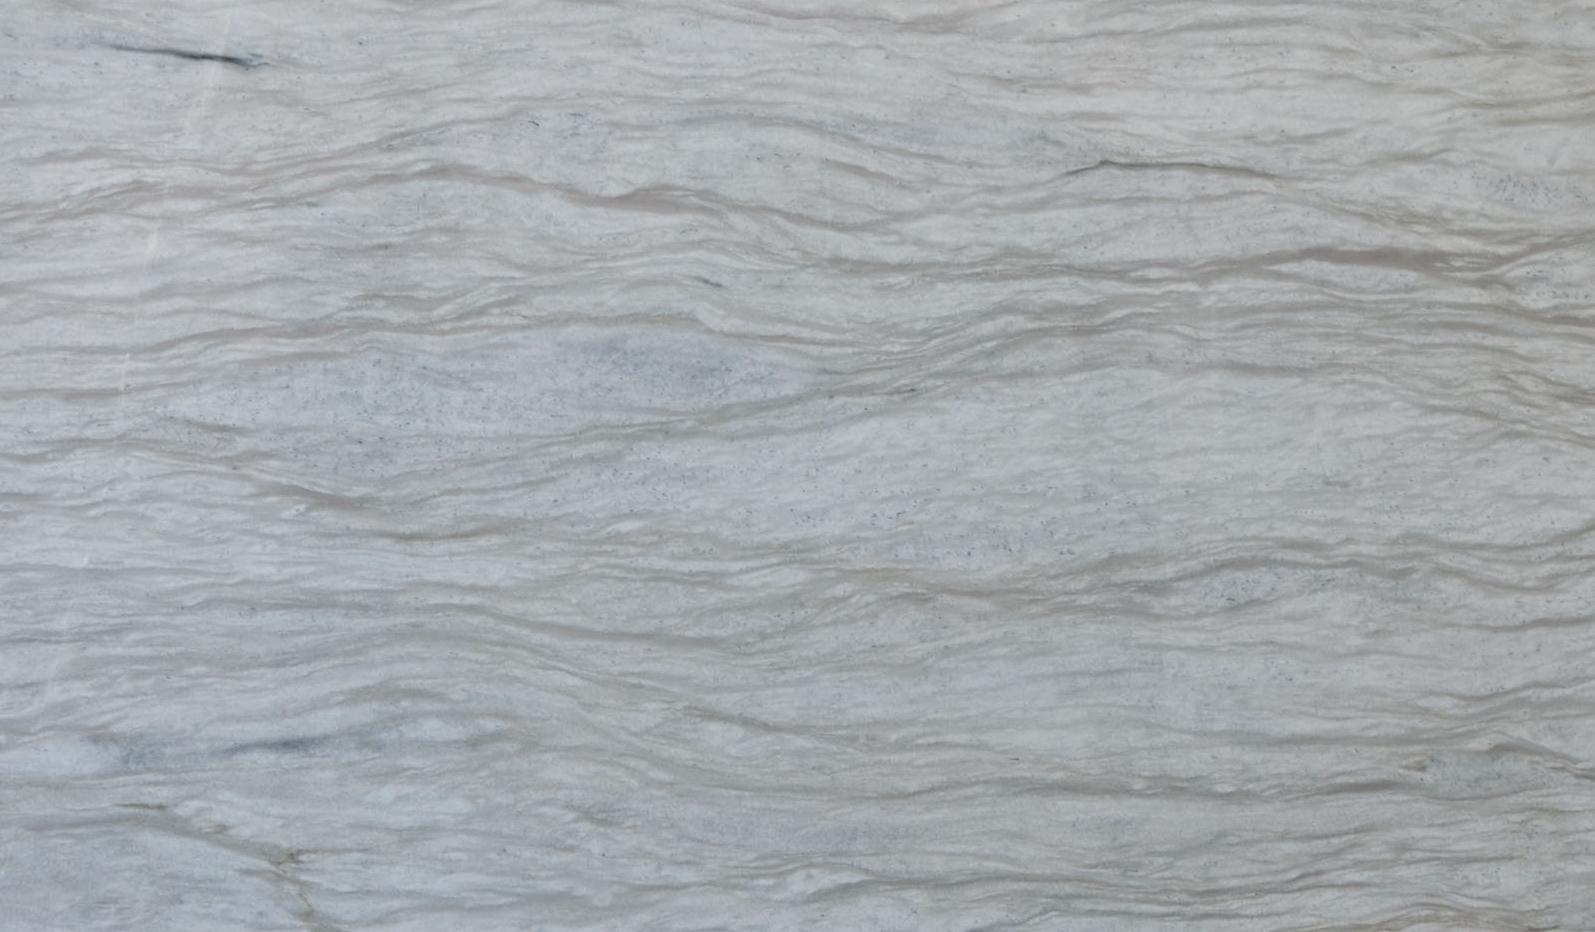 siberian sky abc stone abc stone